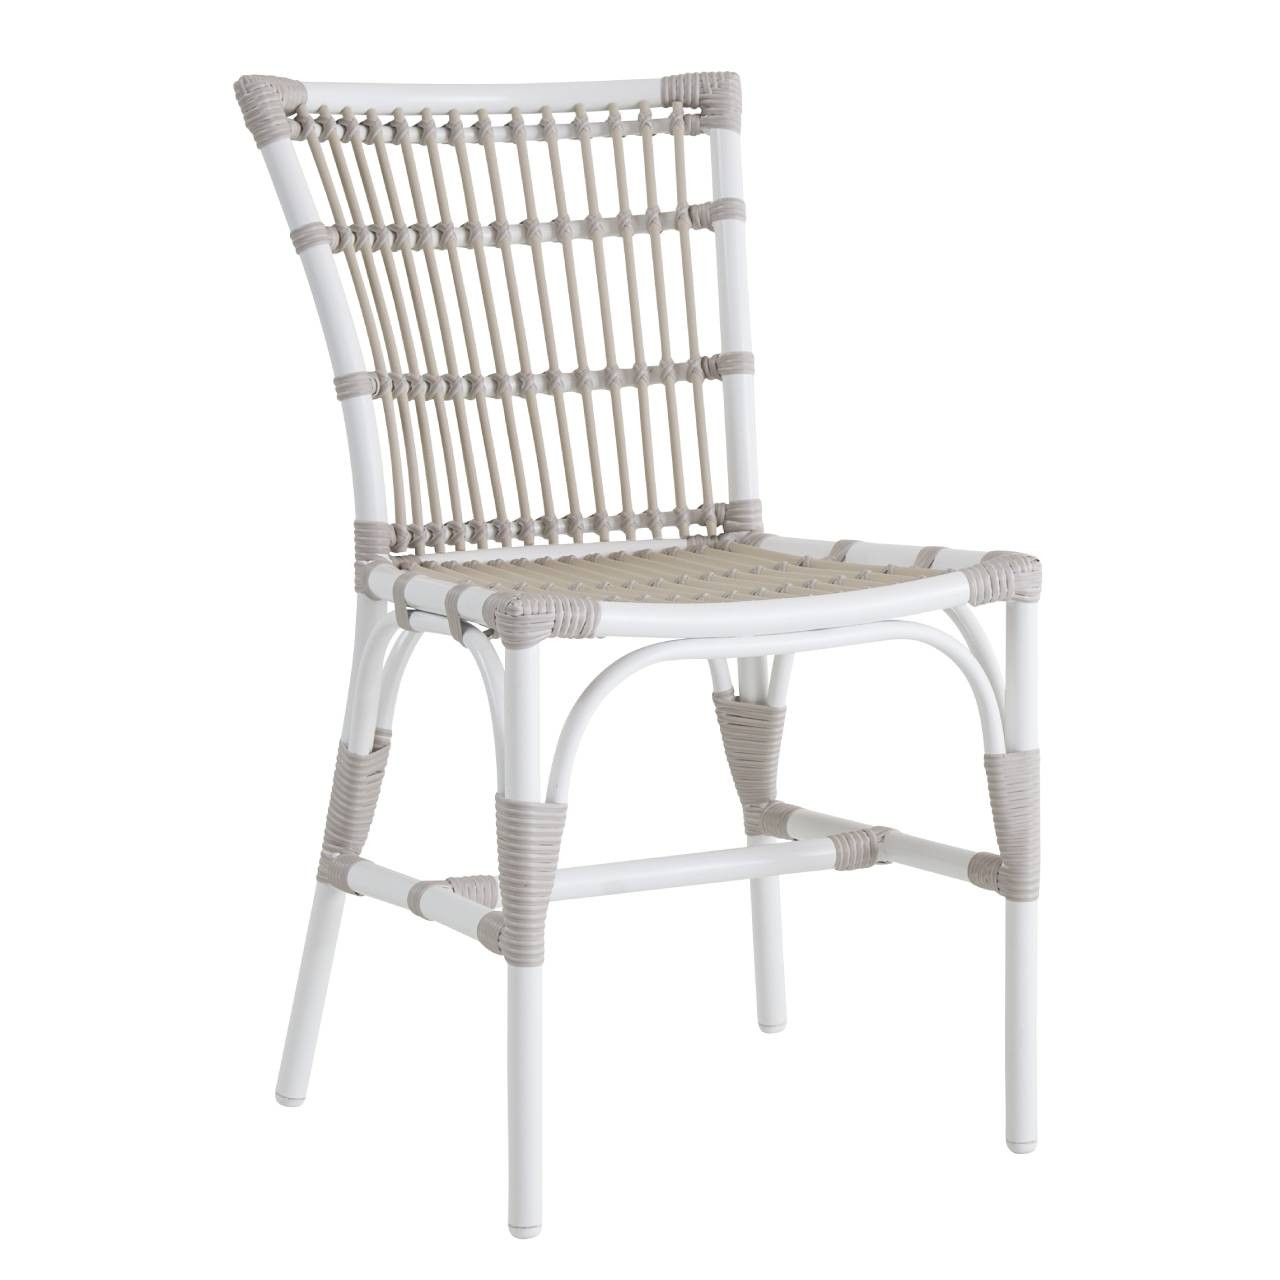 Incredible Sika Design Elisabeth Chair Exterior Unemploymentrelief Wooden Chair Designs For Living Room Unemploymentrelieforg